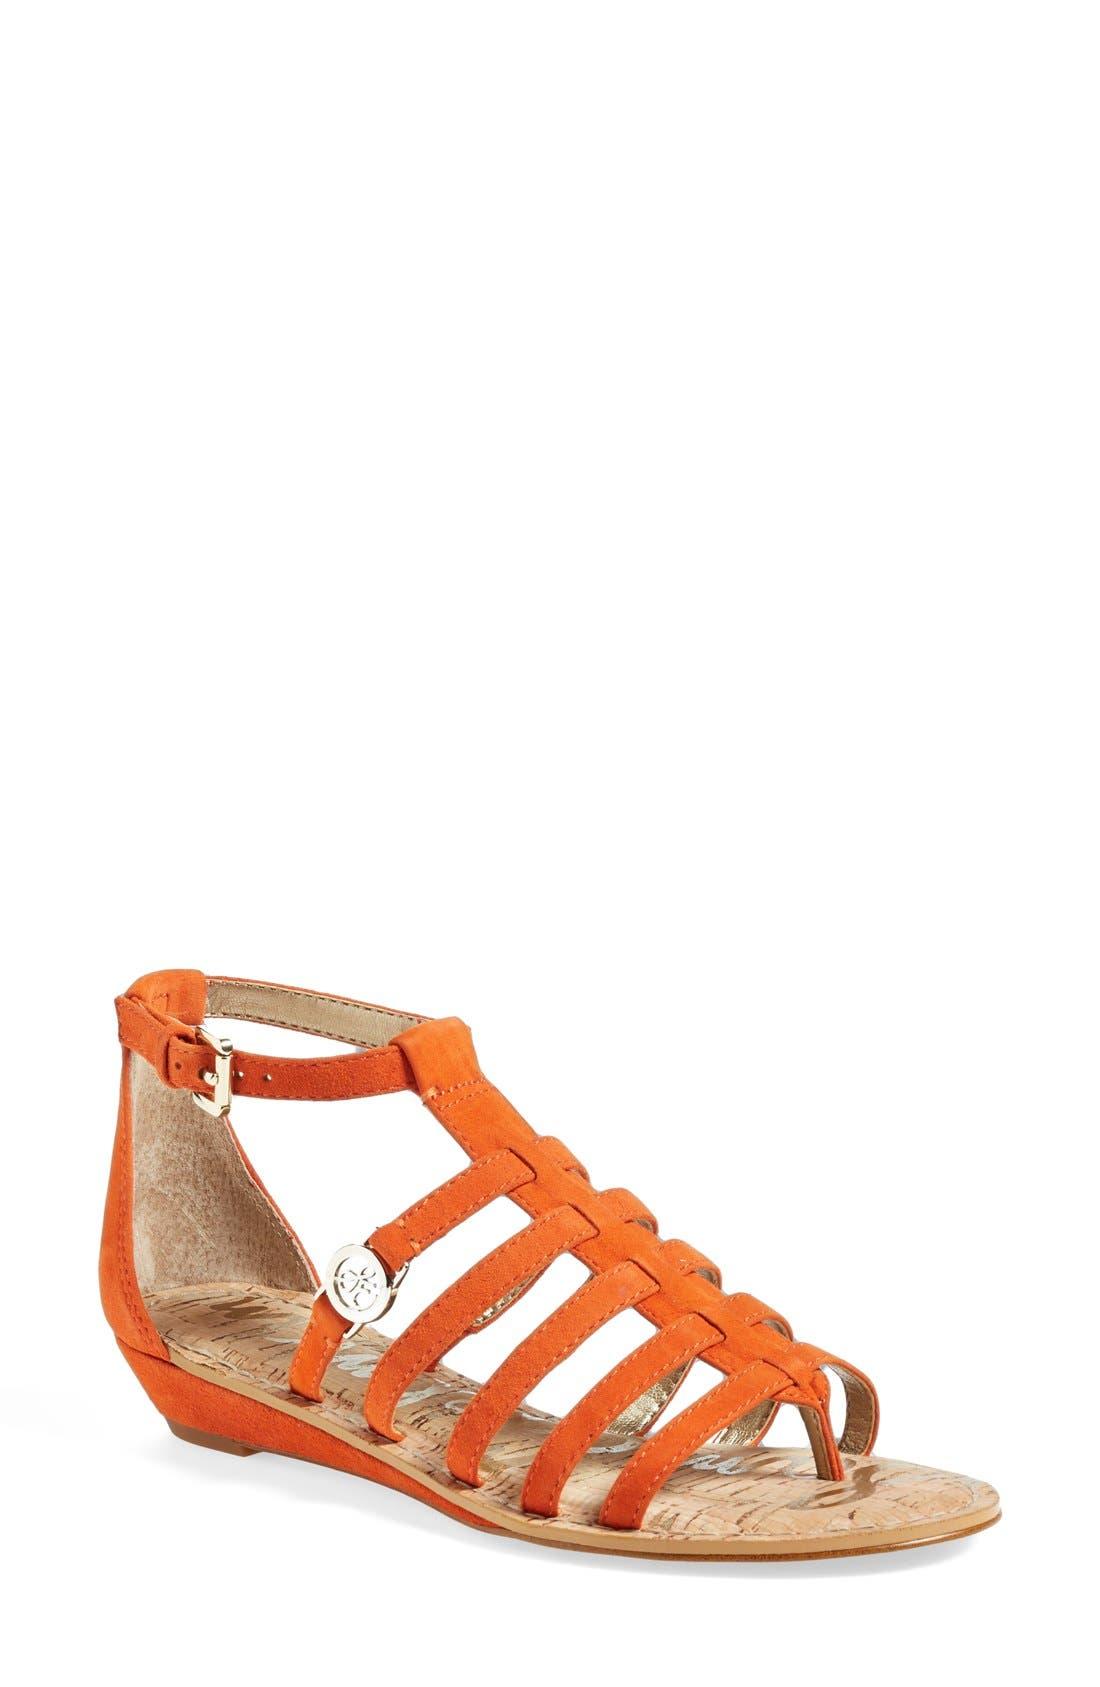 Main Image - Sam Edelman 'Donna' Gladiator Sandal (Women)